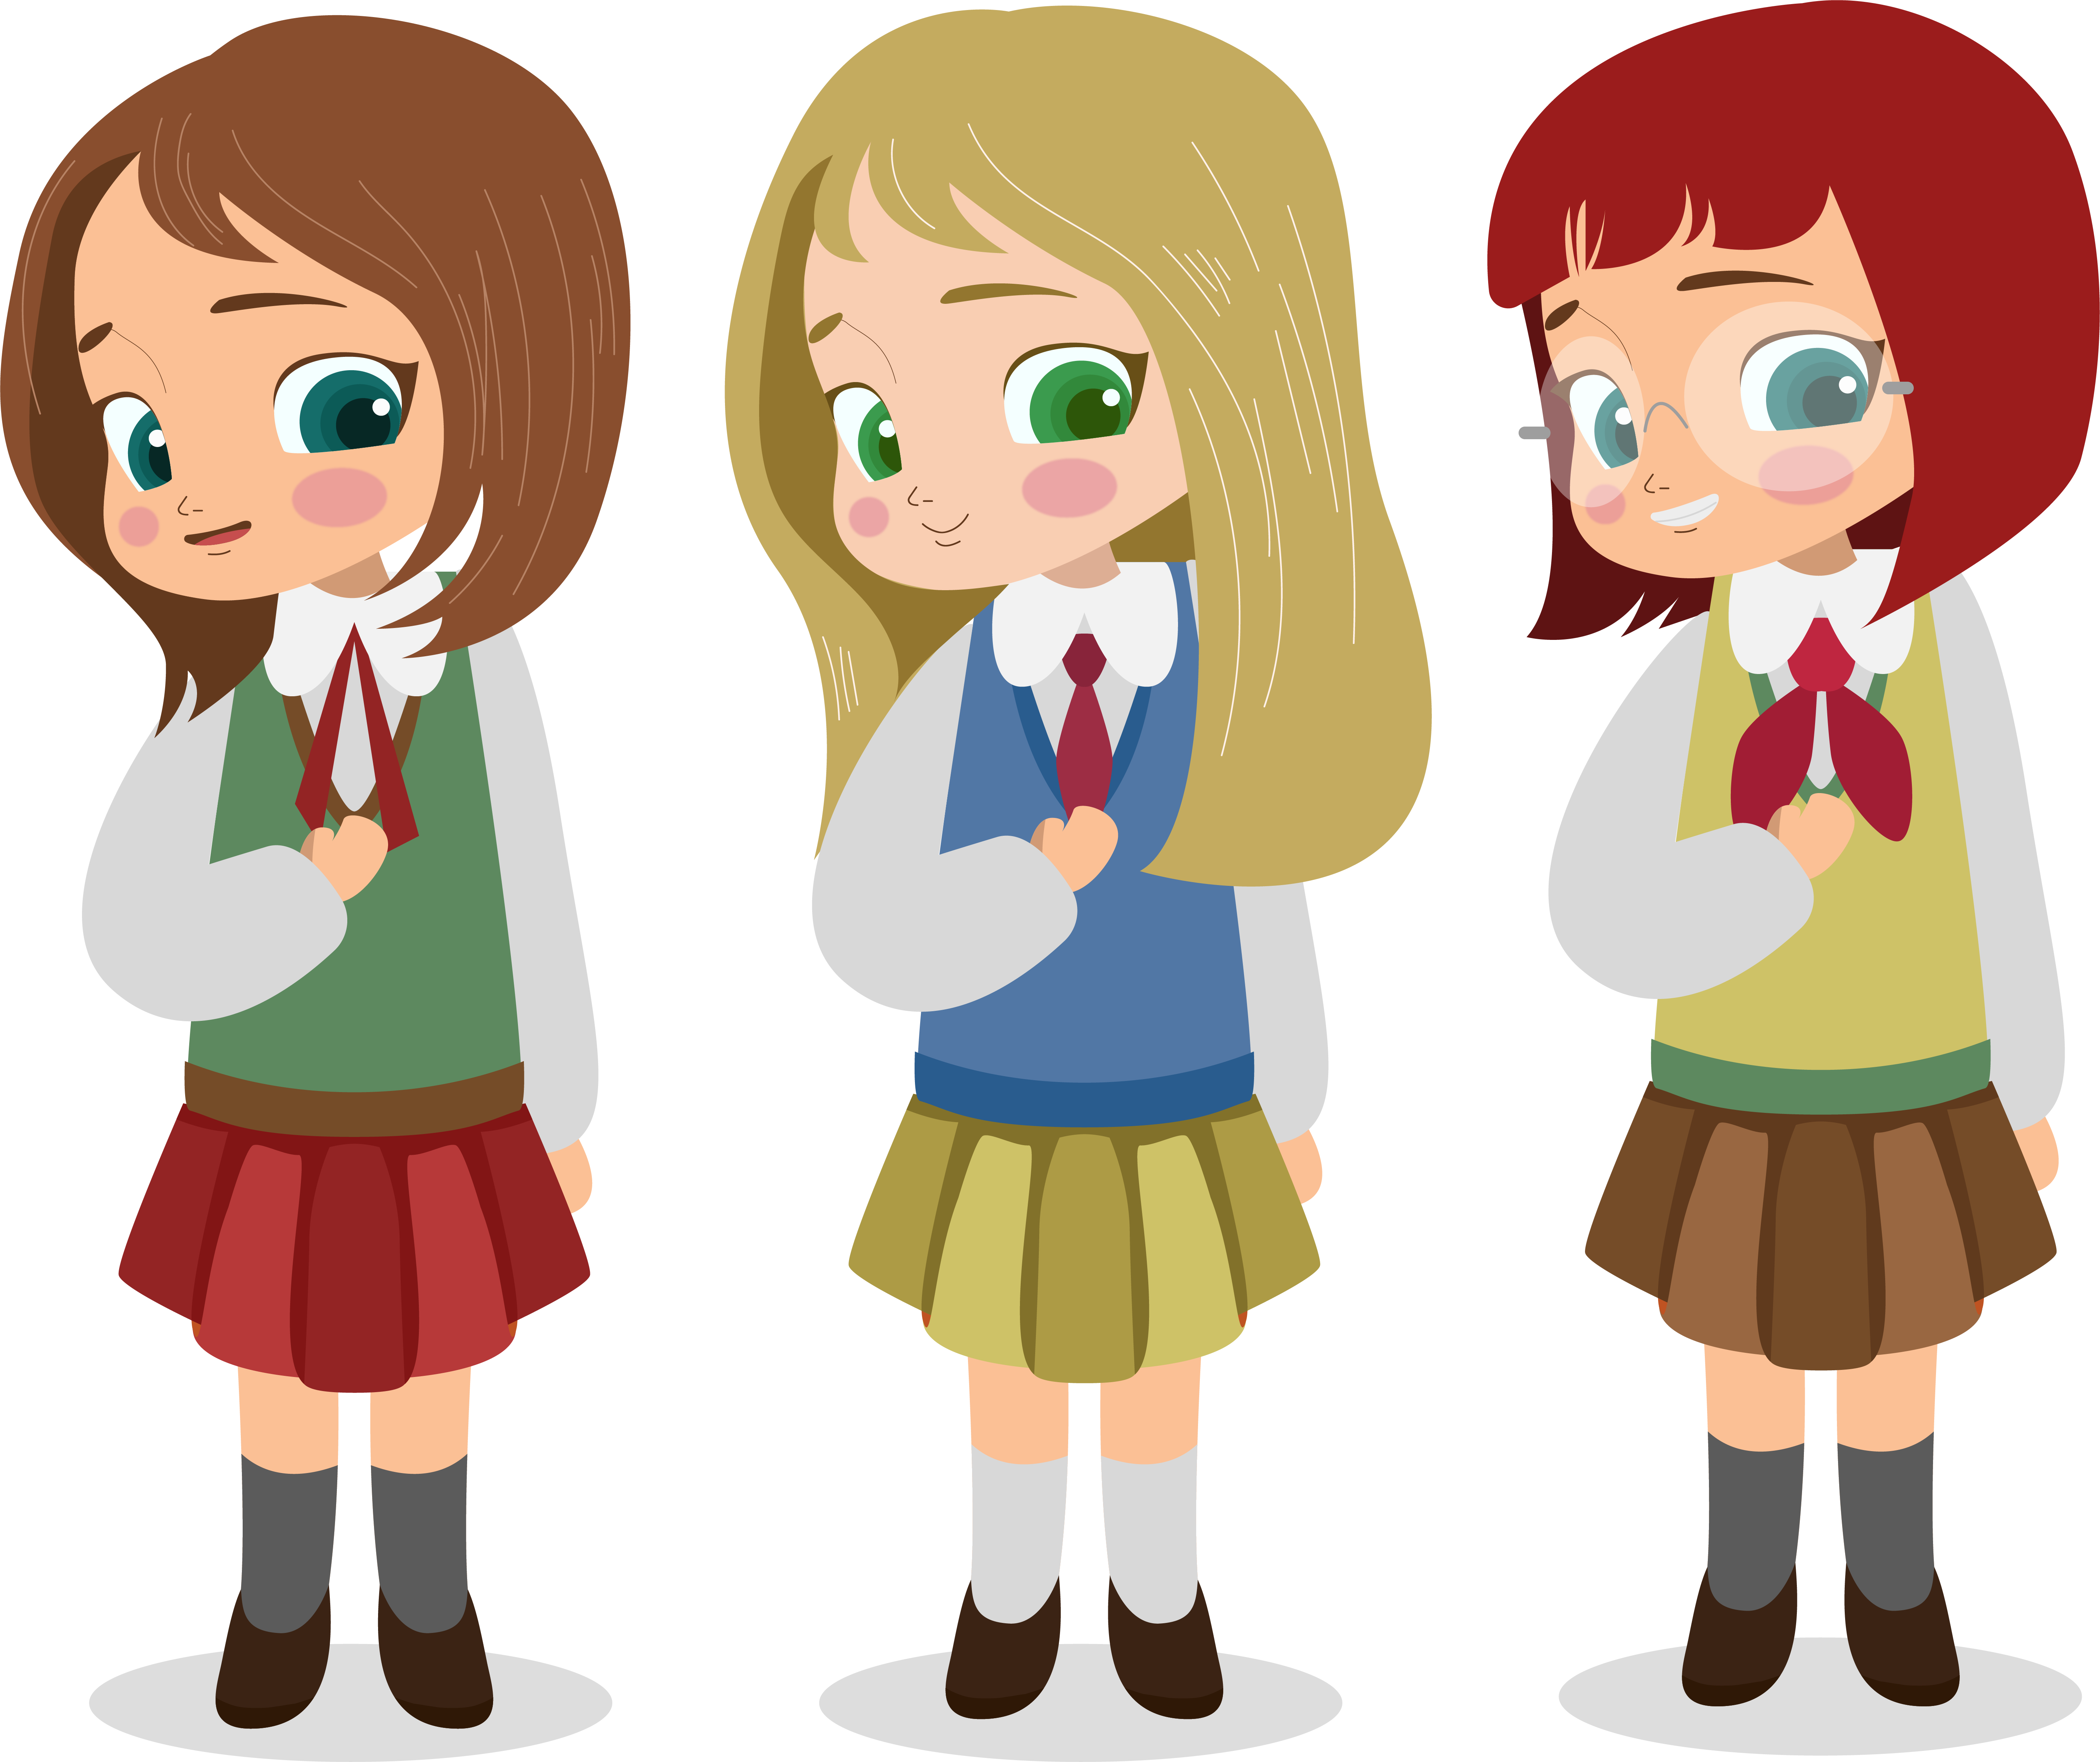 Free school uniform clipart jpg transparent stock School uniform Child Student - school children 5660*4750 transprent ... jpg transparent stock